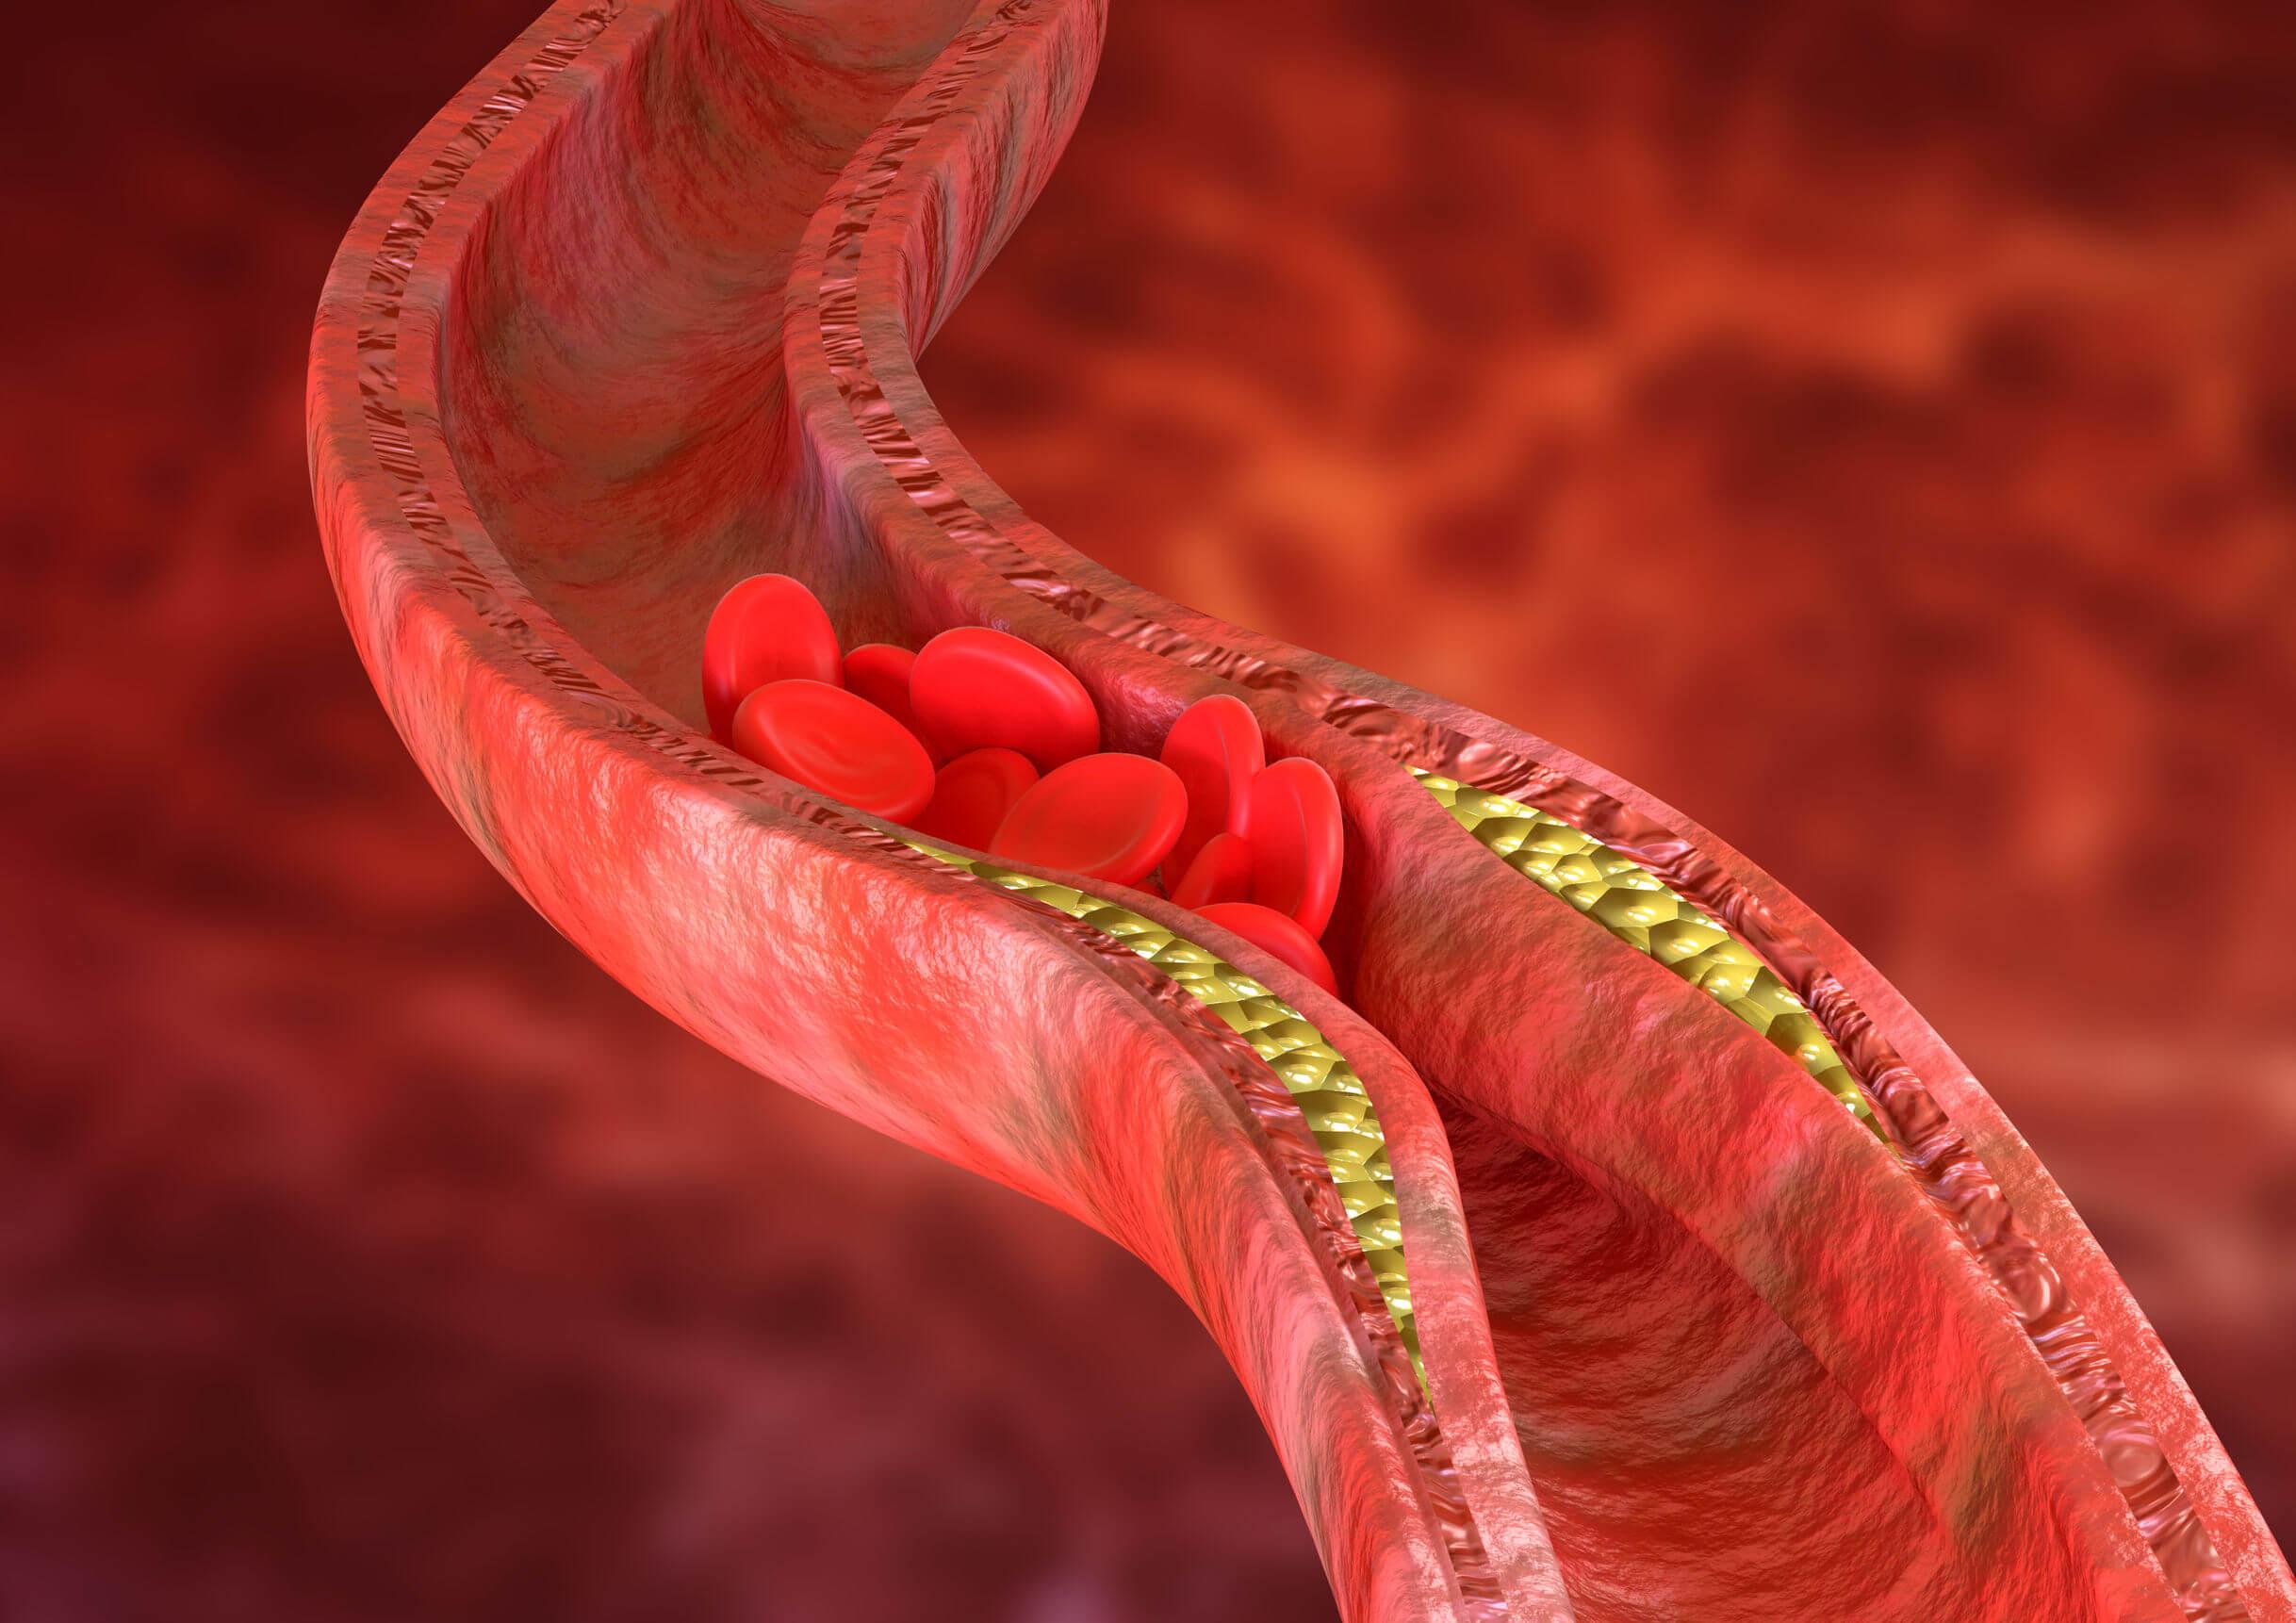 La simvastatina se utiliza para la aterosclerosis.